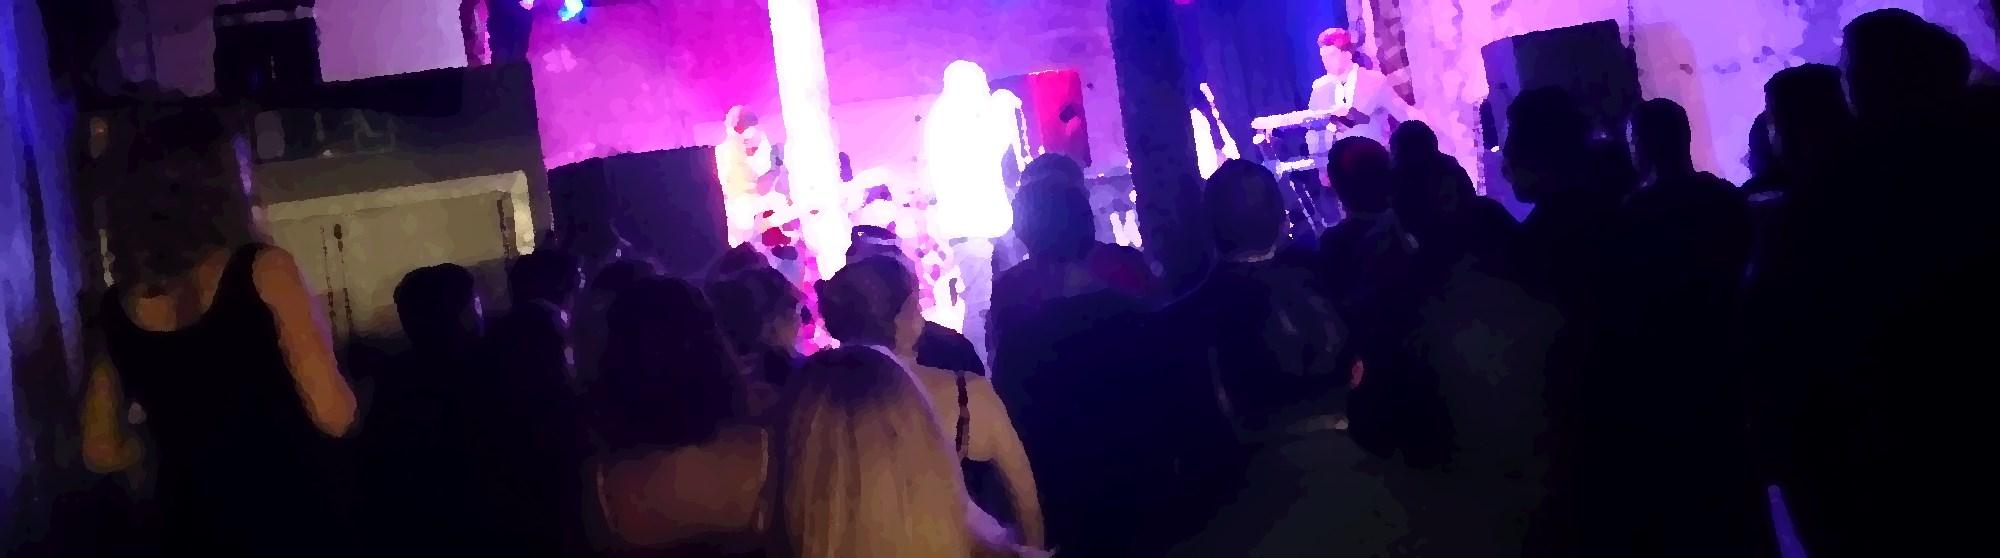 Sonny Marvello live at Stereo